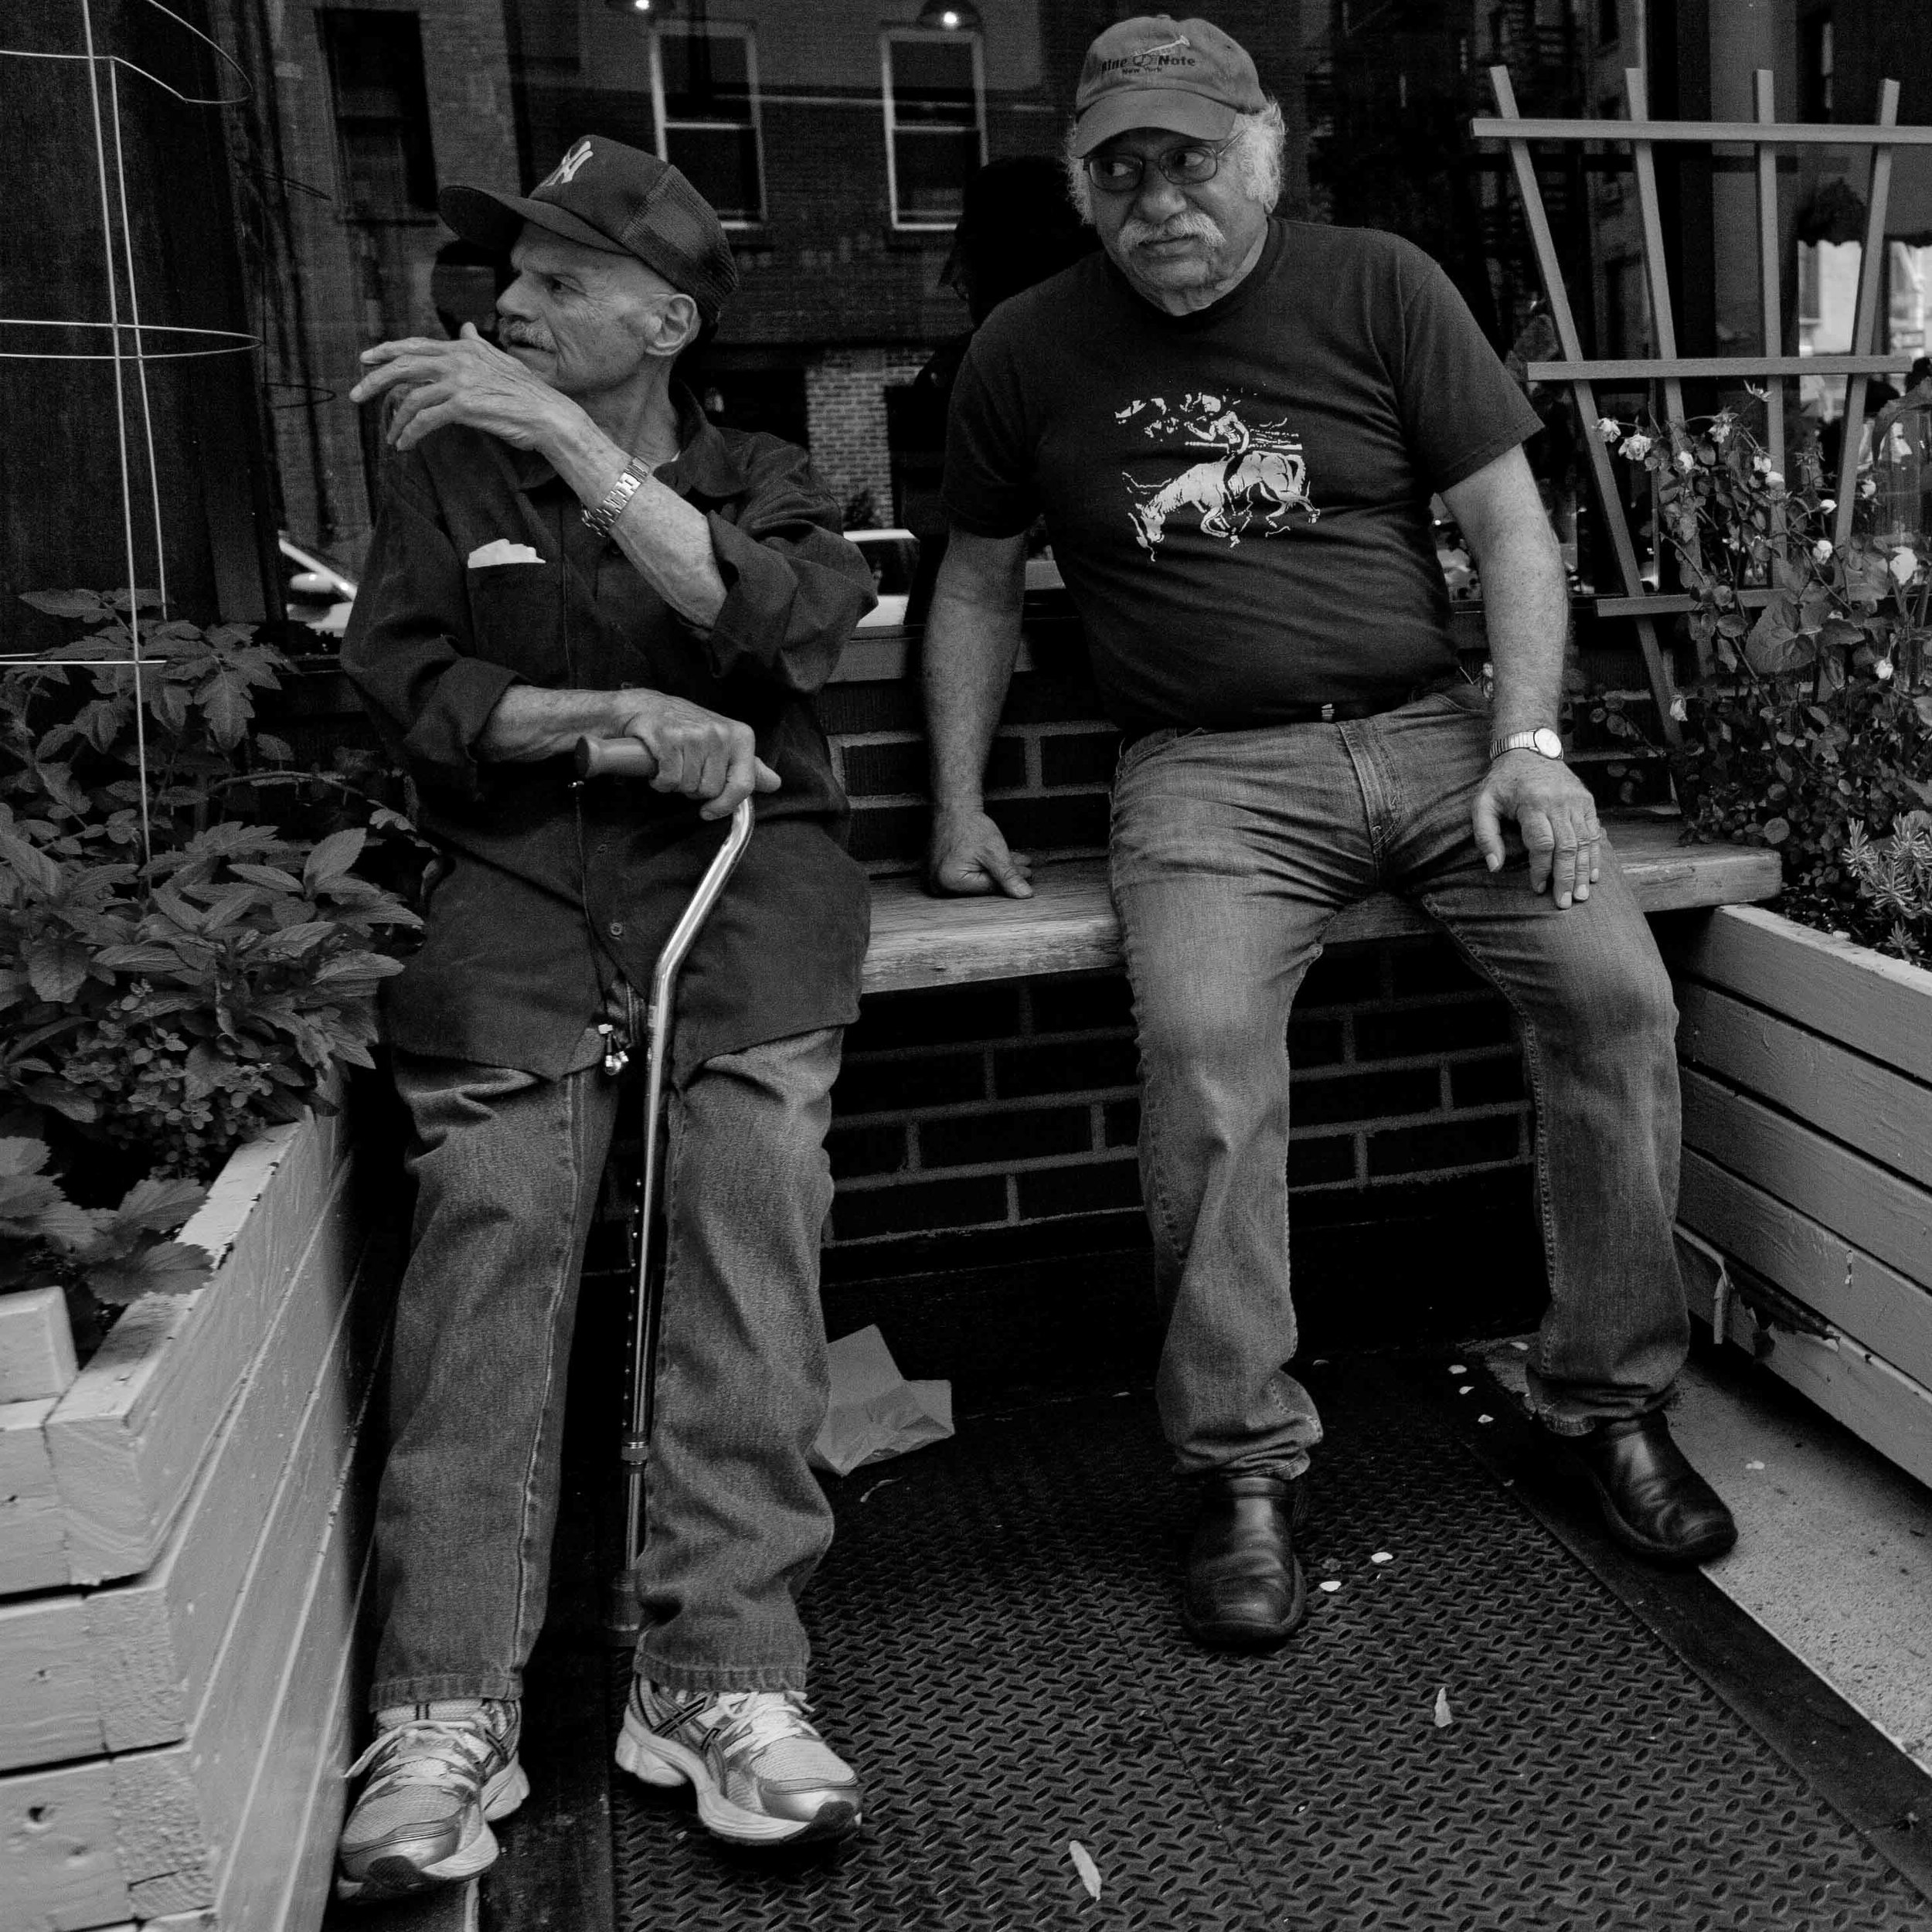 Streetphotography 3.0-121.jpg